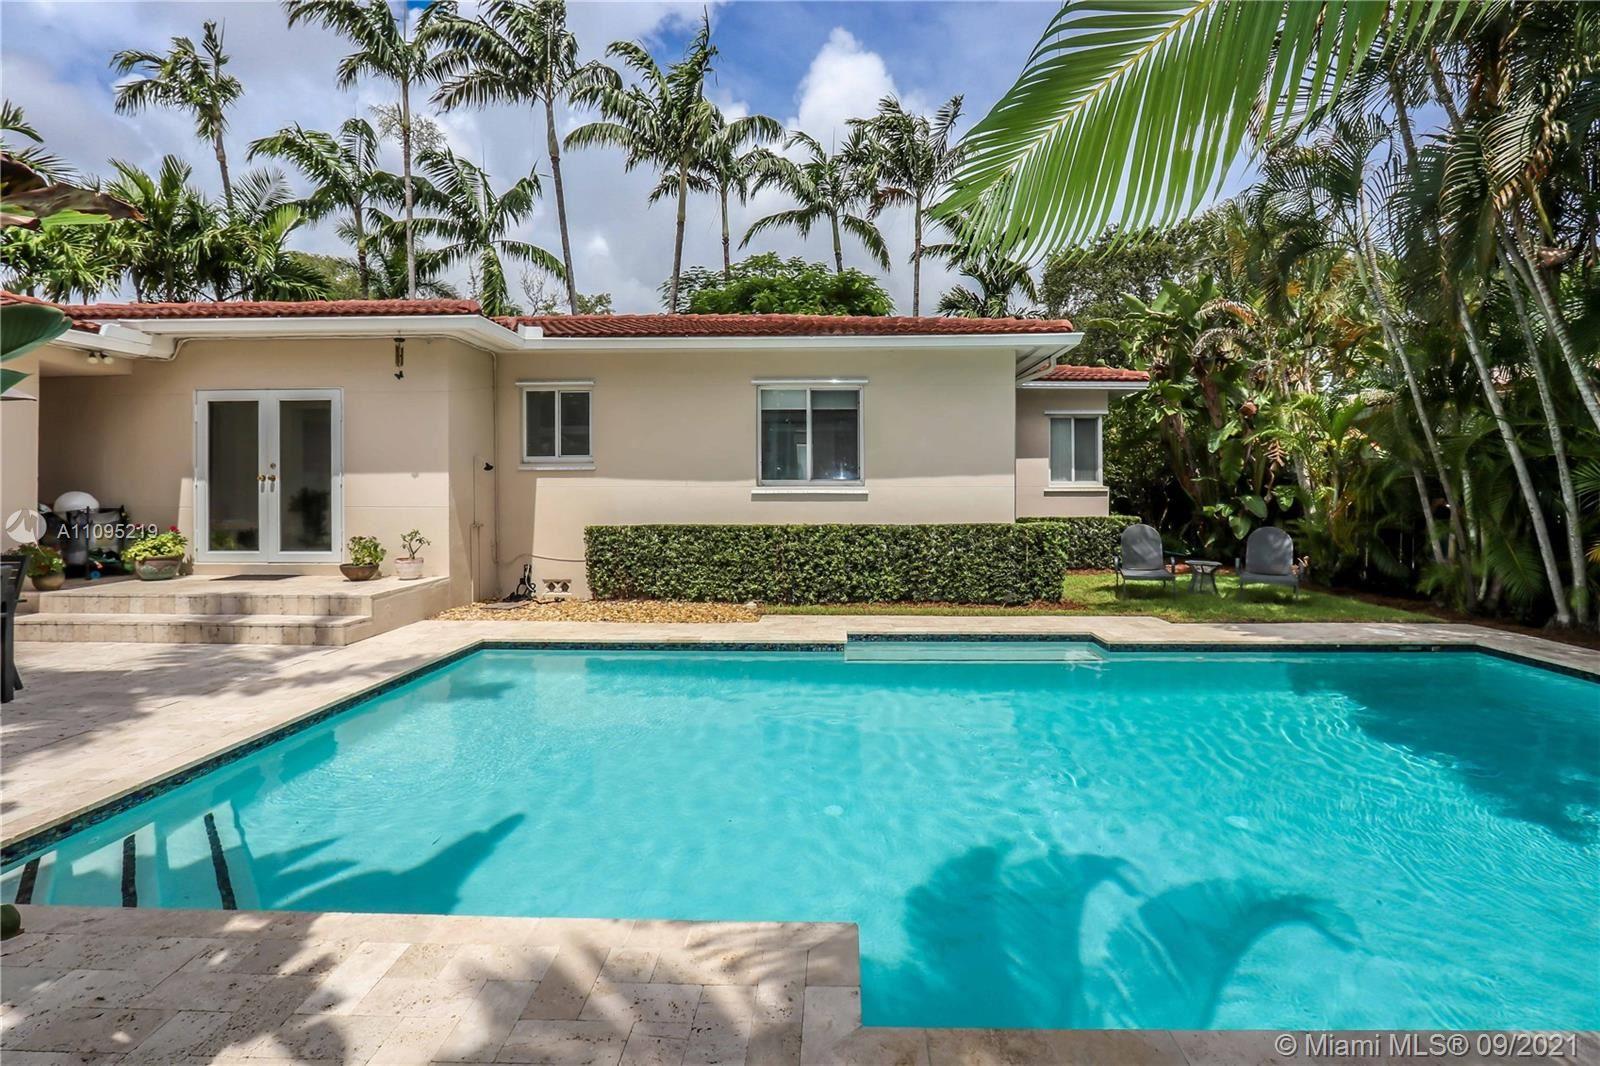 1522 Monroe St, Hollywood, FL 33020 - #: A11095219